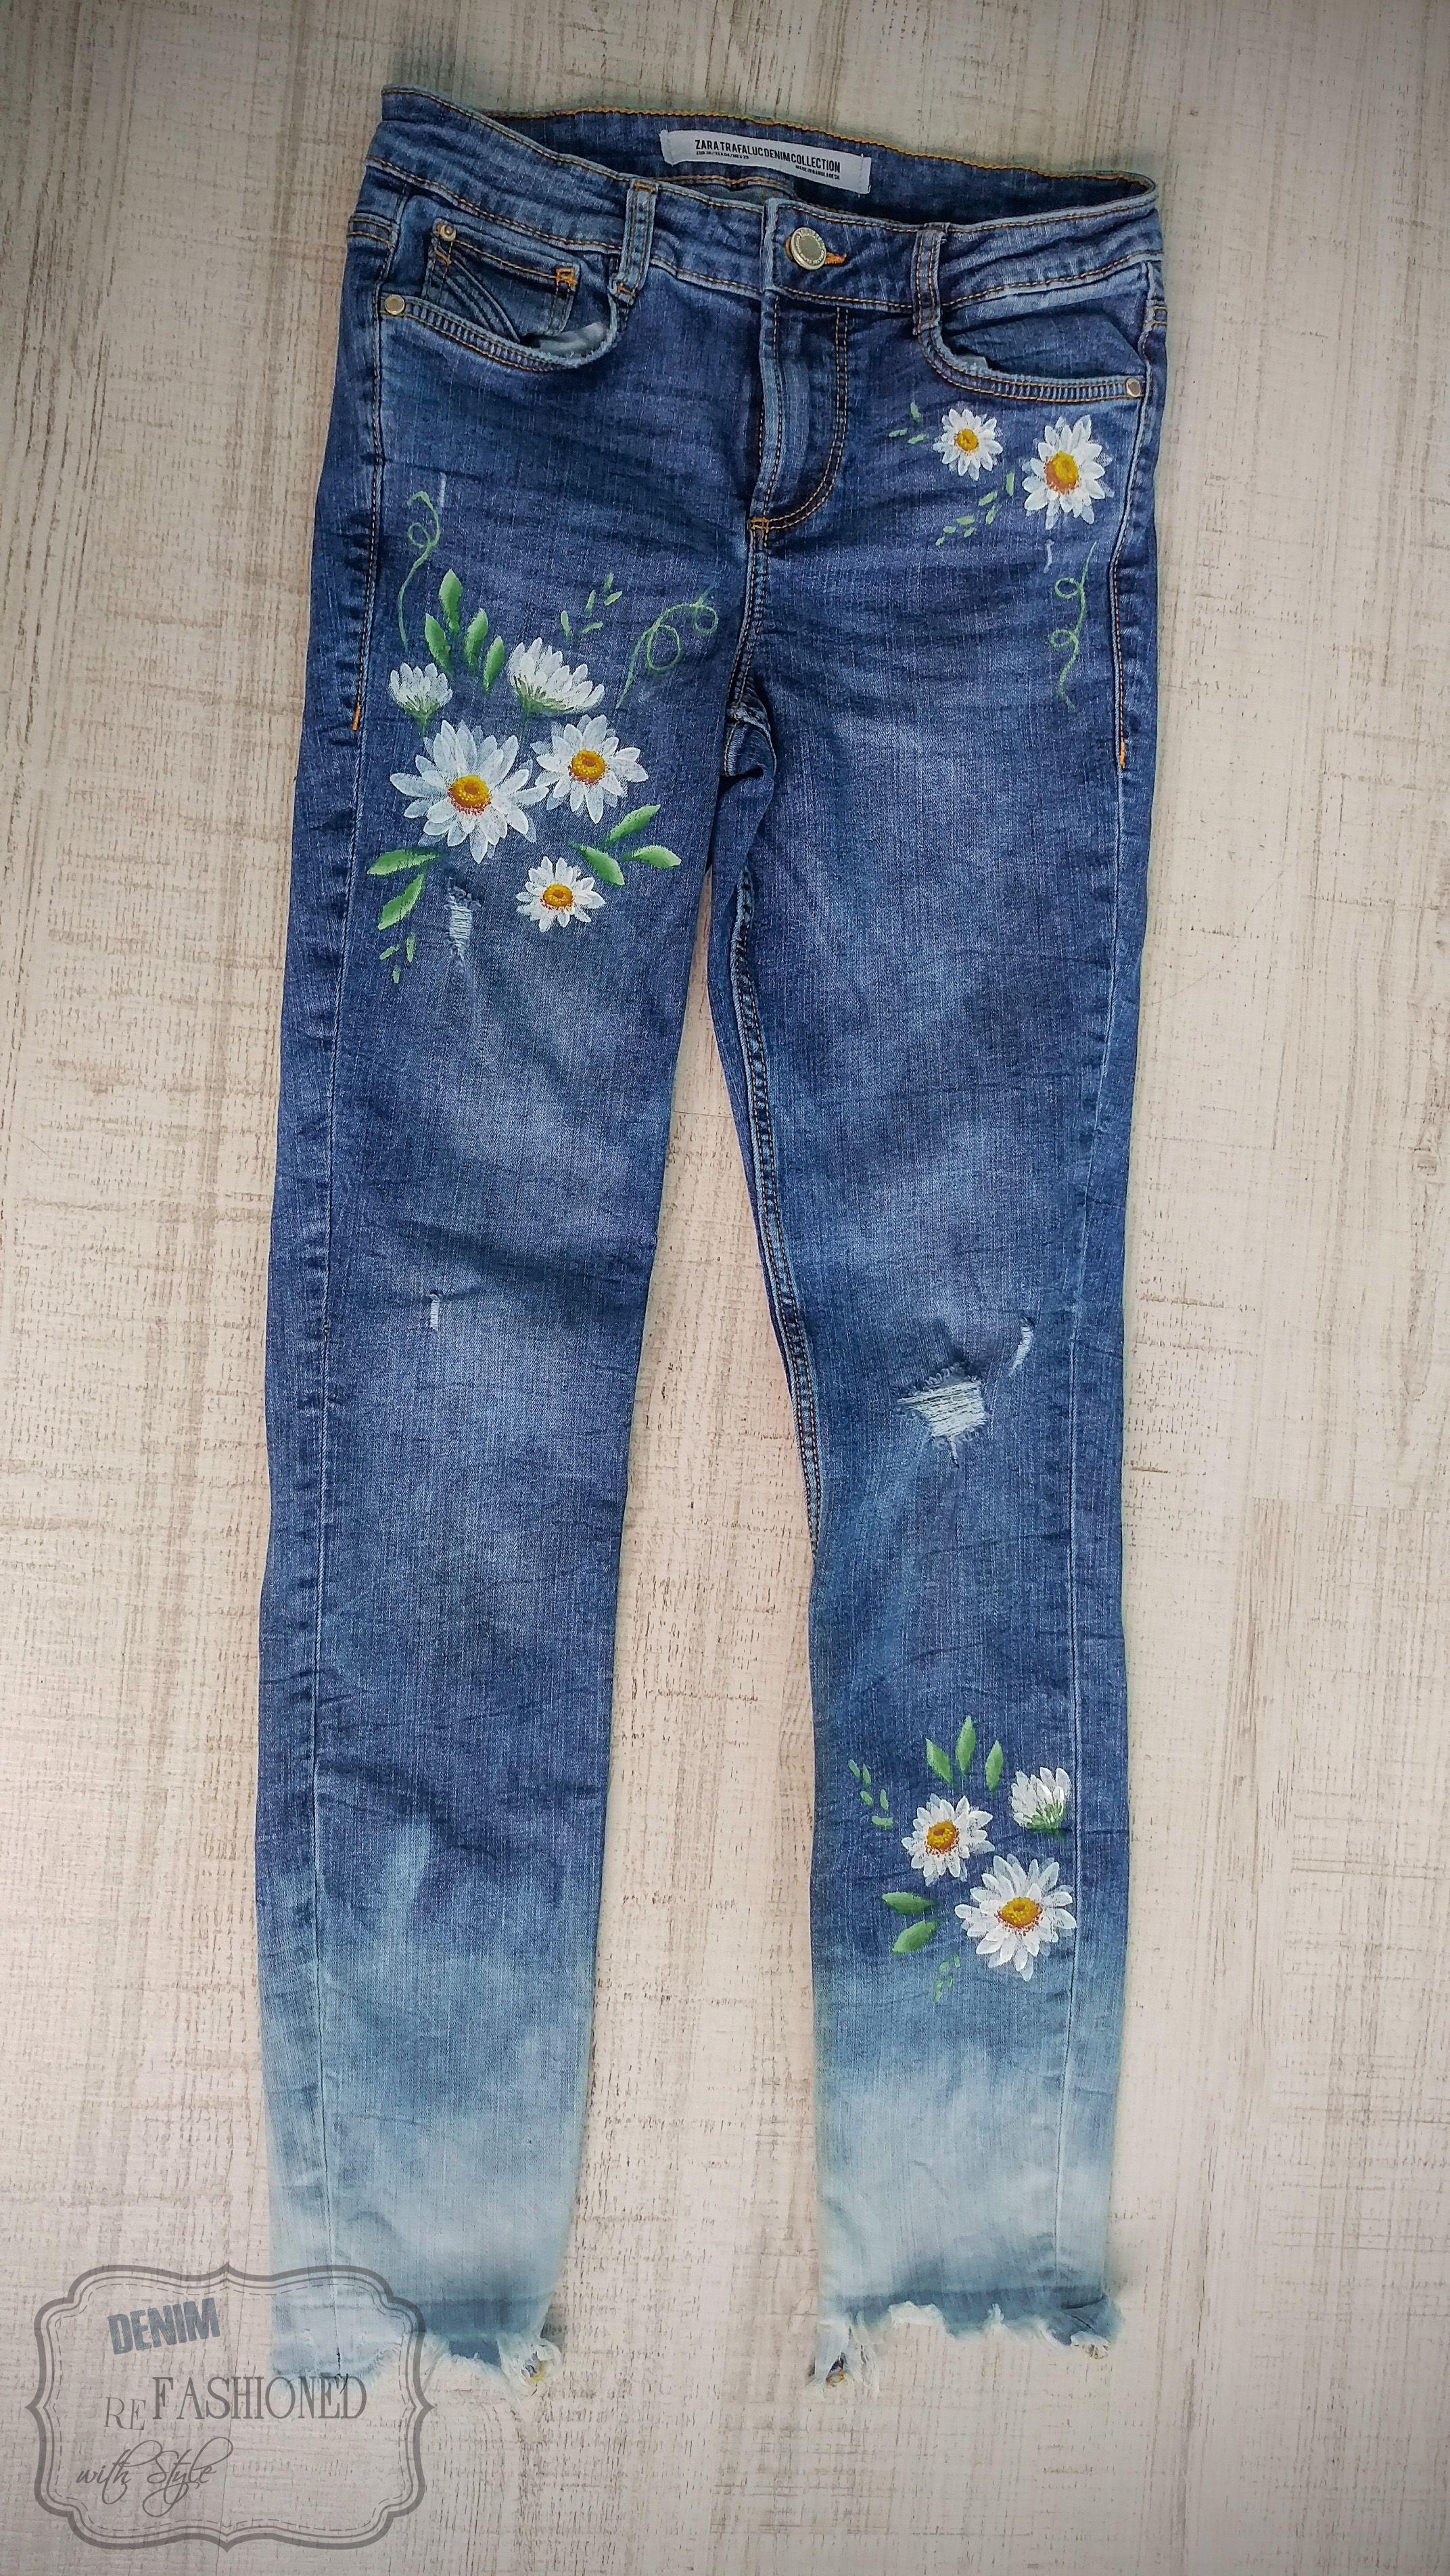 Painted Blue Denim Jeans Daisy Flowers